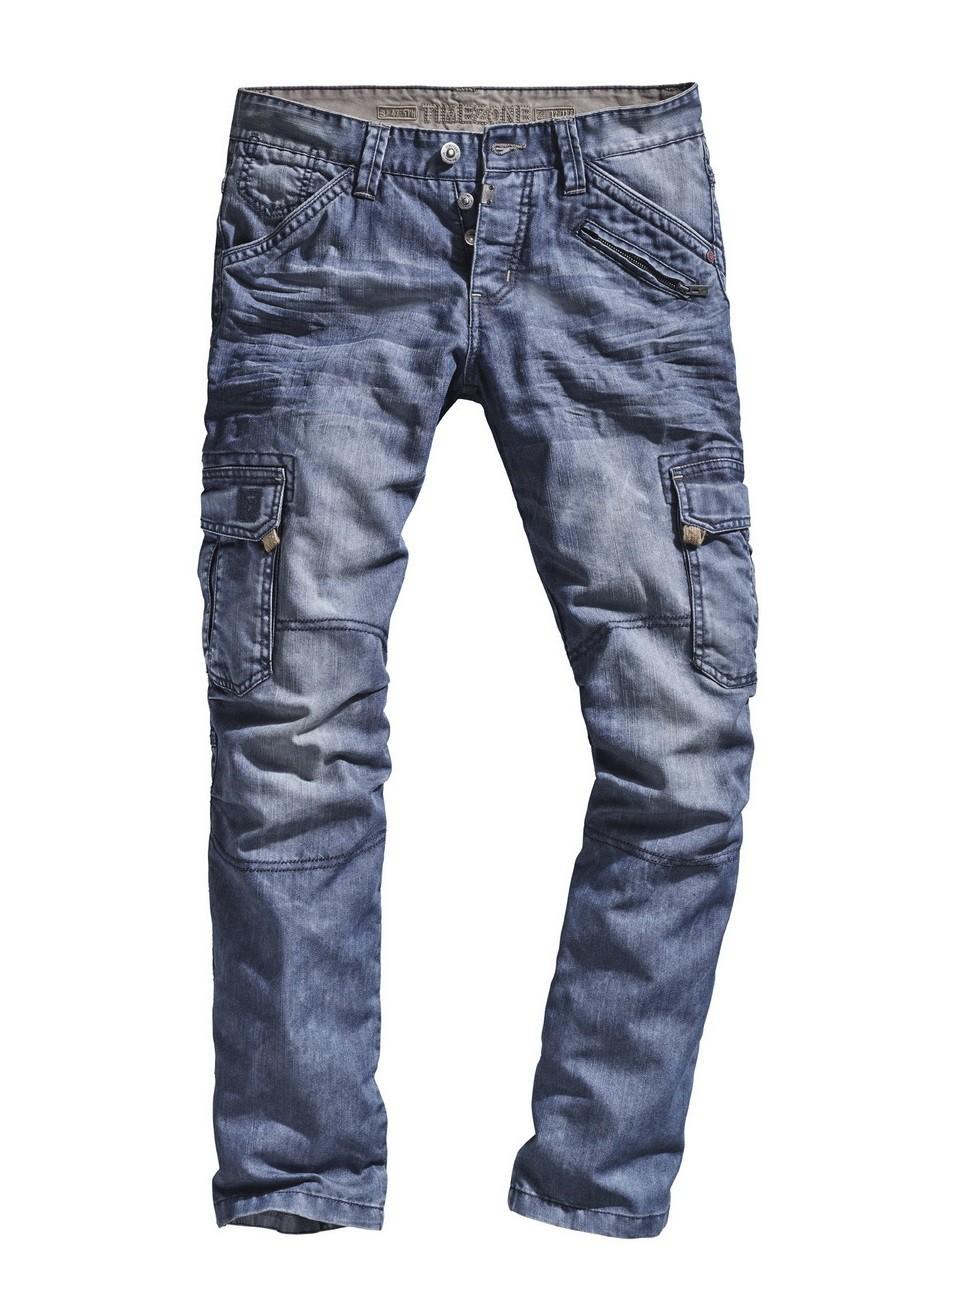 timezone herren cargo jeans benitotz loose fit blau. Black Bedroom Furniture Sets. Home Design Ideas